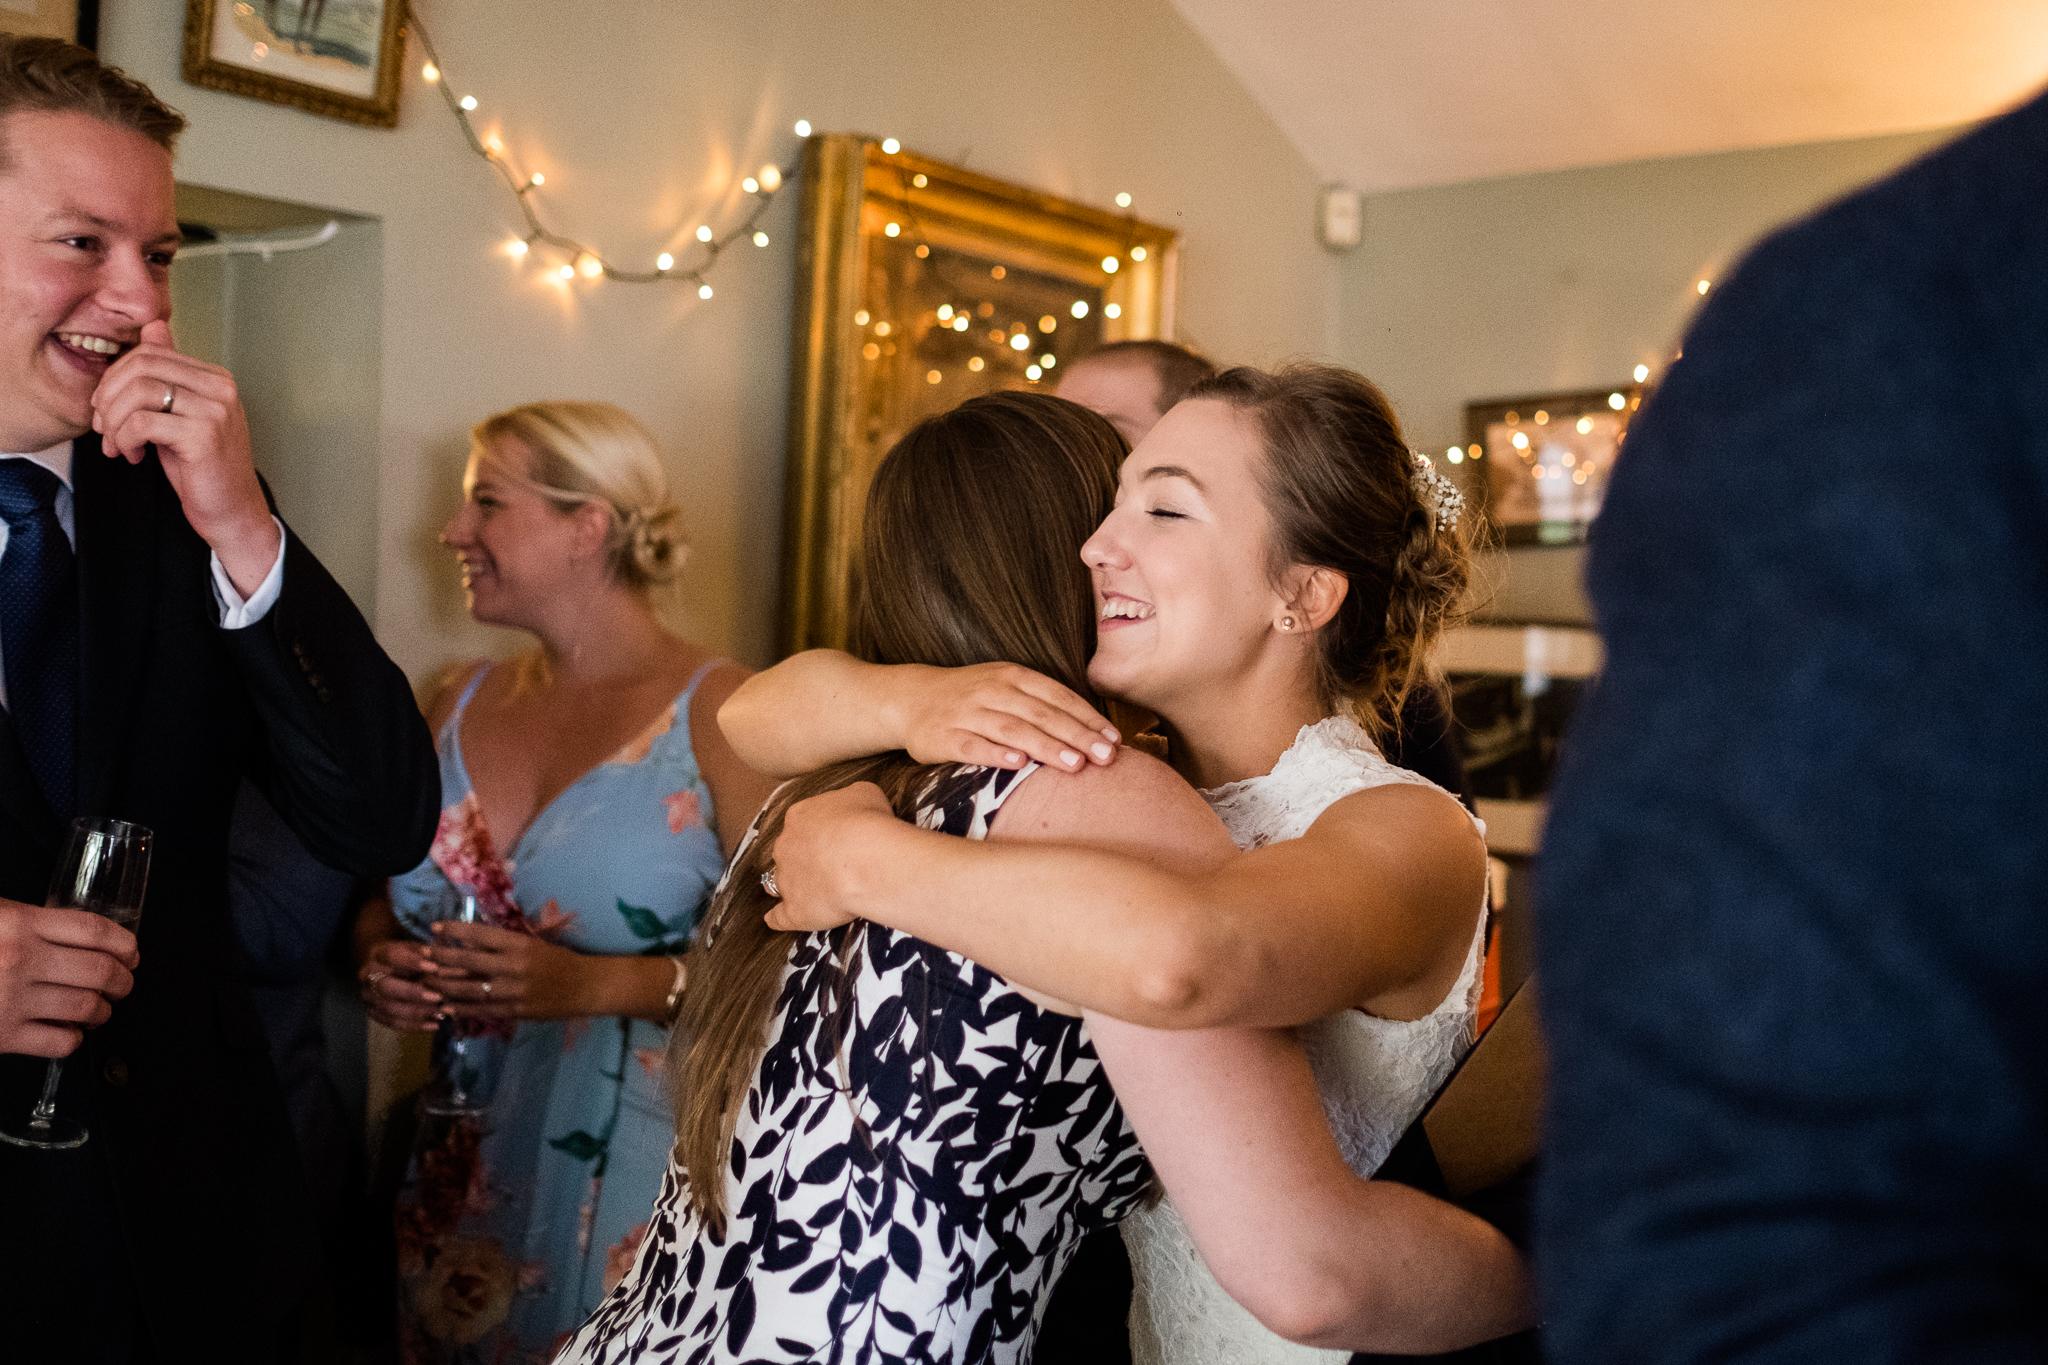 Relaxed Documentary Wedding Photography at The Wizard Inn, Alderley Edge Cheshire - Jenny Harper-55.jpg